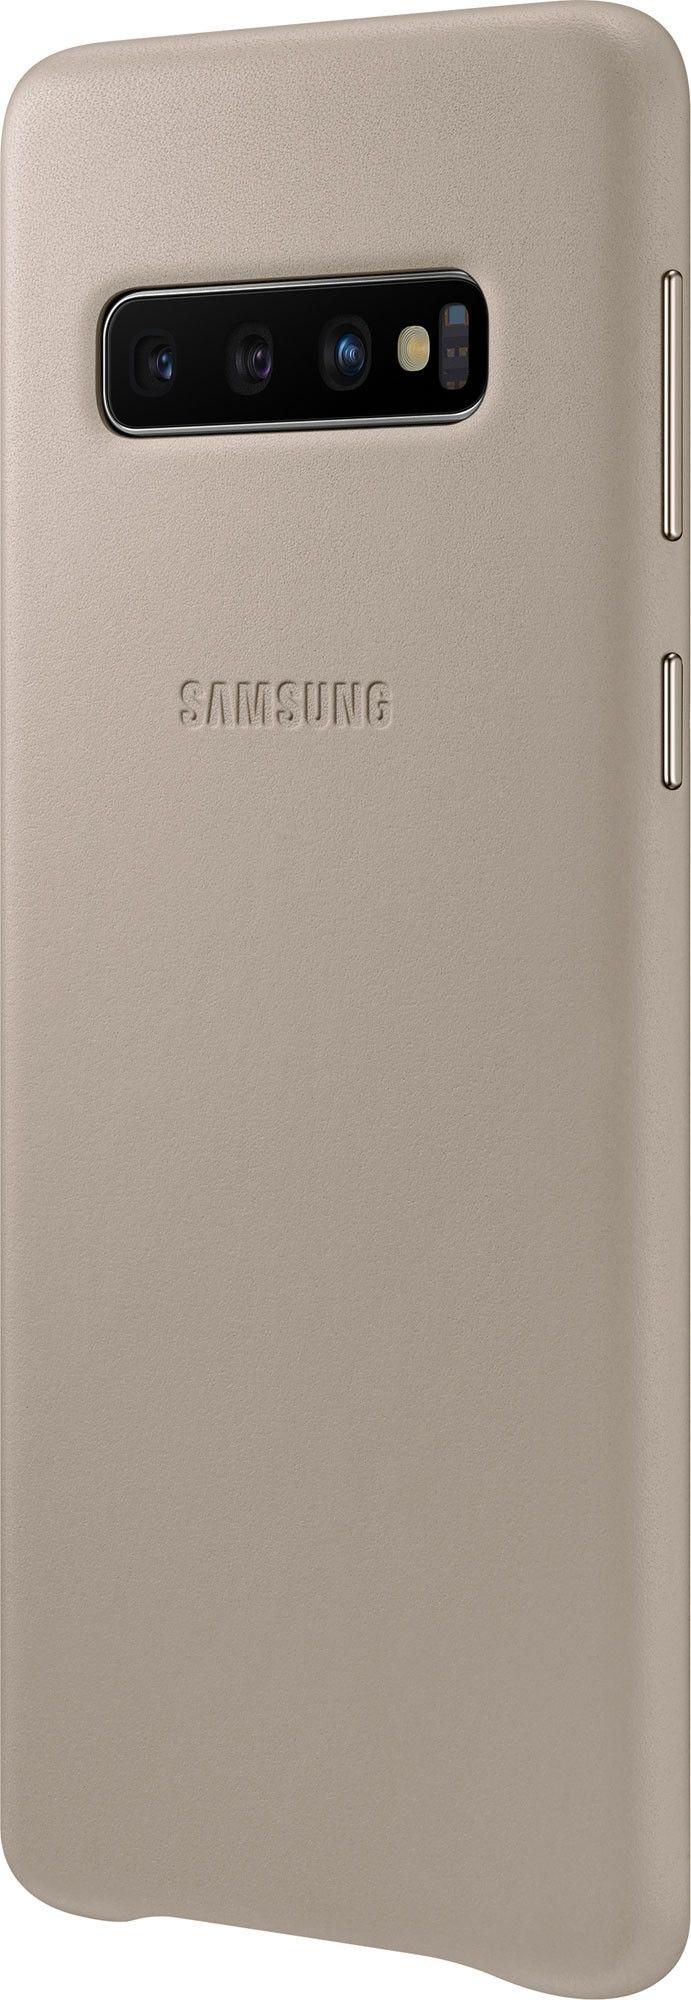 Панель Samsung Leather Cover для Samsung Galaxy S10 (EF-VG973LJEGRU) Gray от Територія твоєї техніки - 3